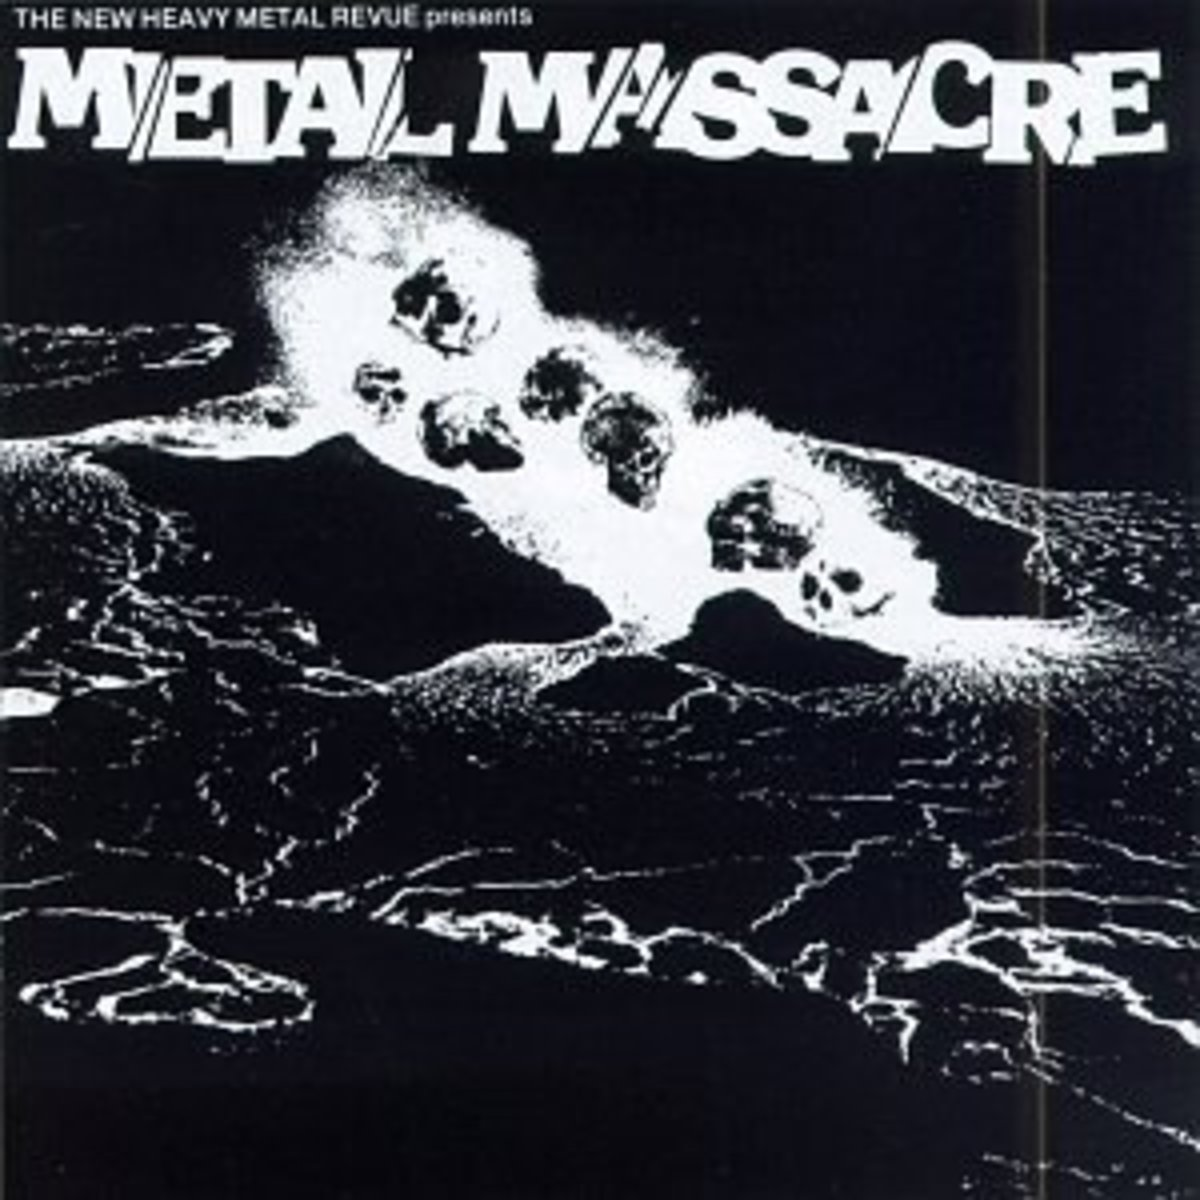 metal_massacre_m1